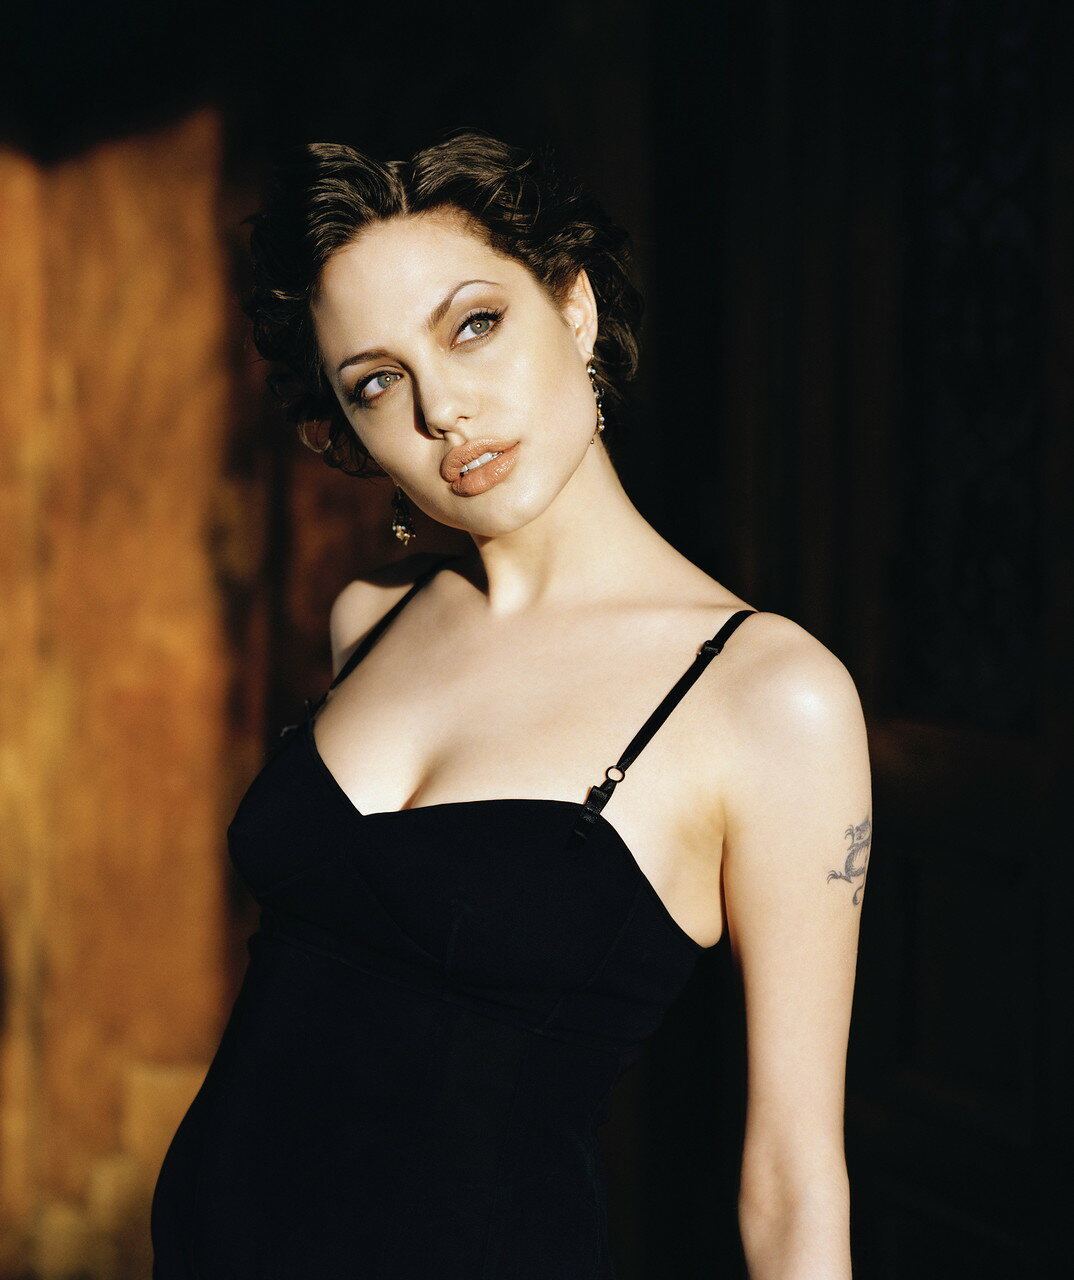 Angelina Jolie, People, May 11, 1998